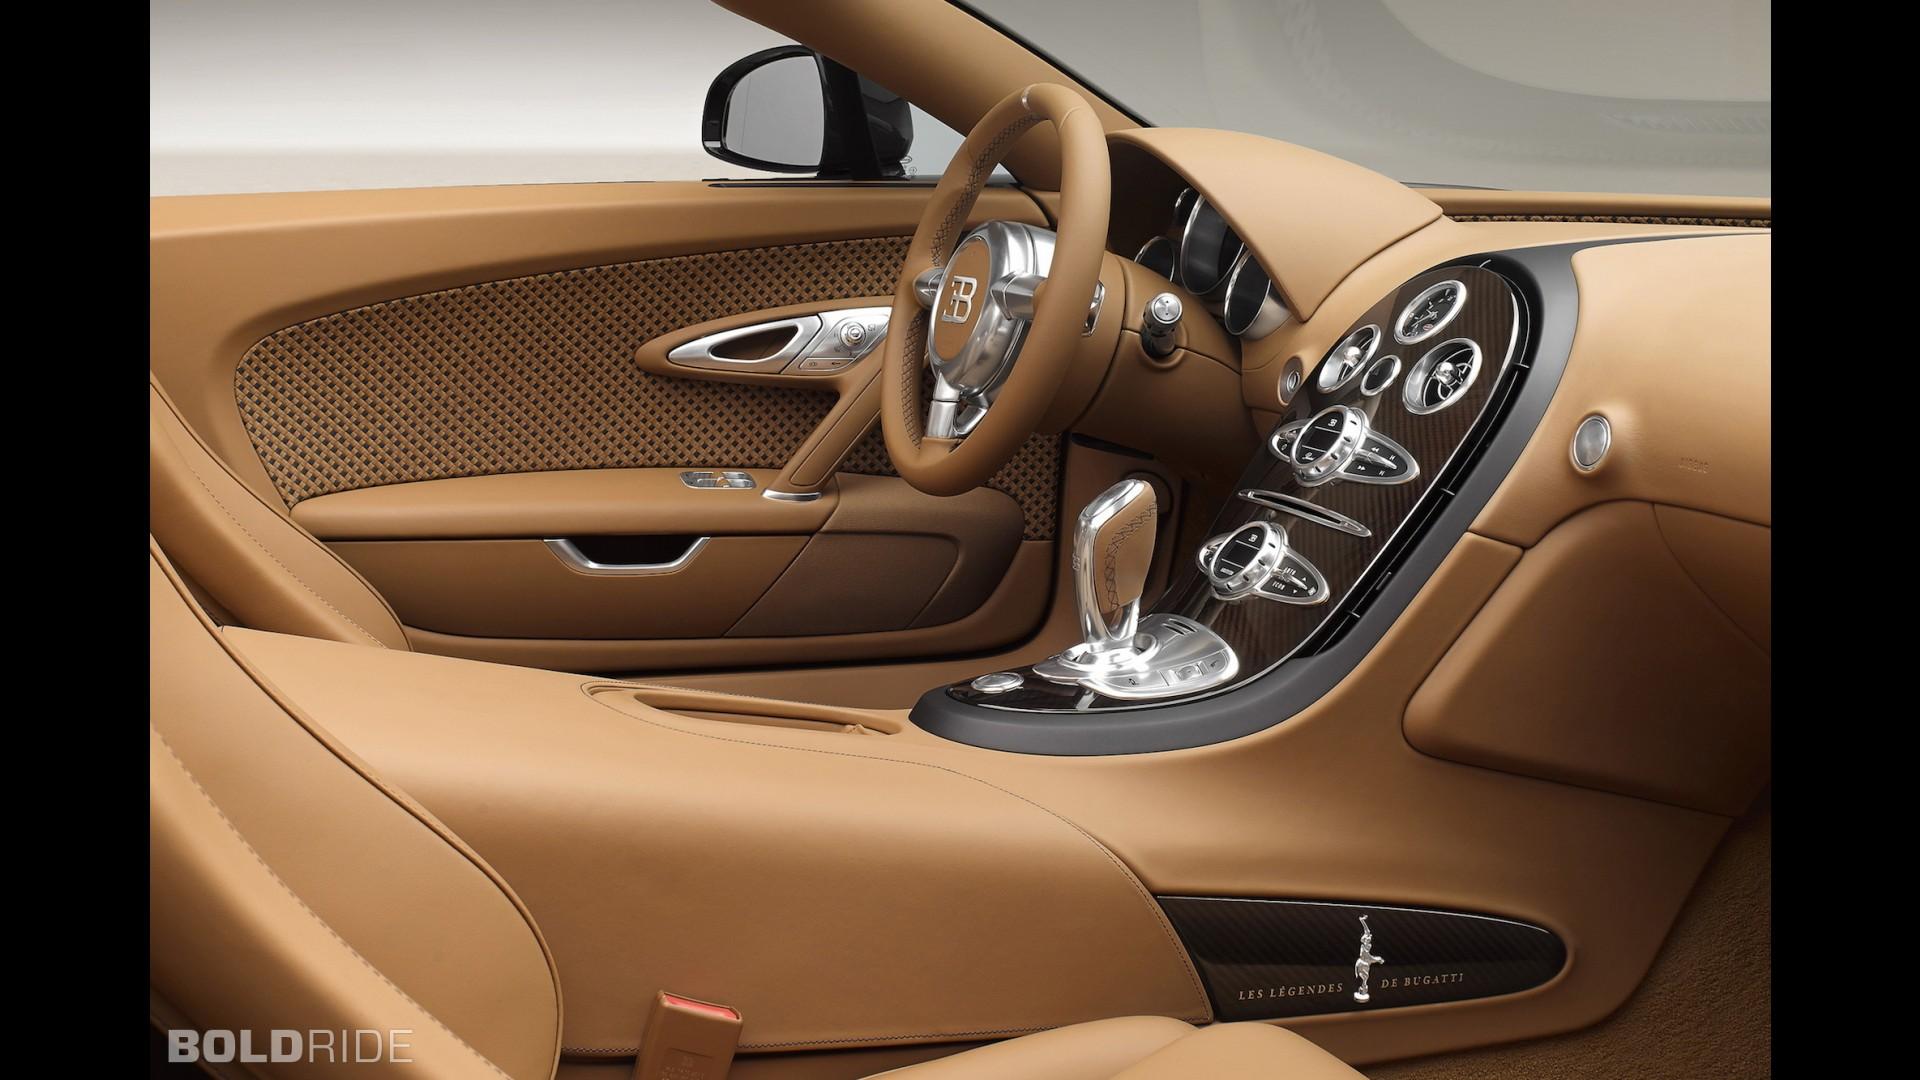 bugatti-veyron-grand-sport-roadster-vitesse-rembrandt Cozy Bugatti Veyron Rembrandt Edition Price Cars Trend